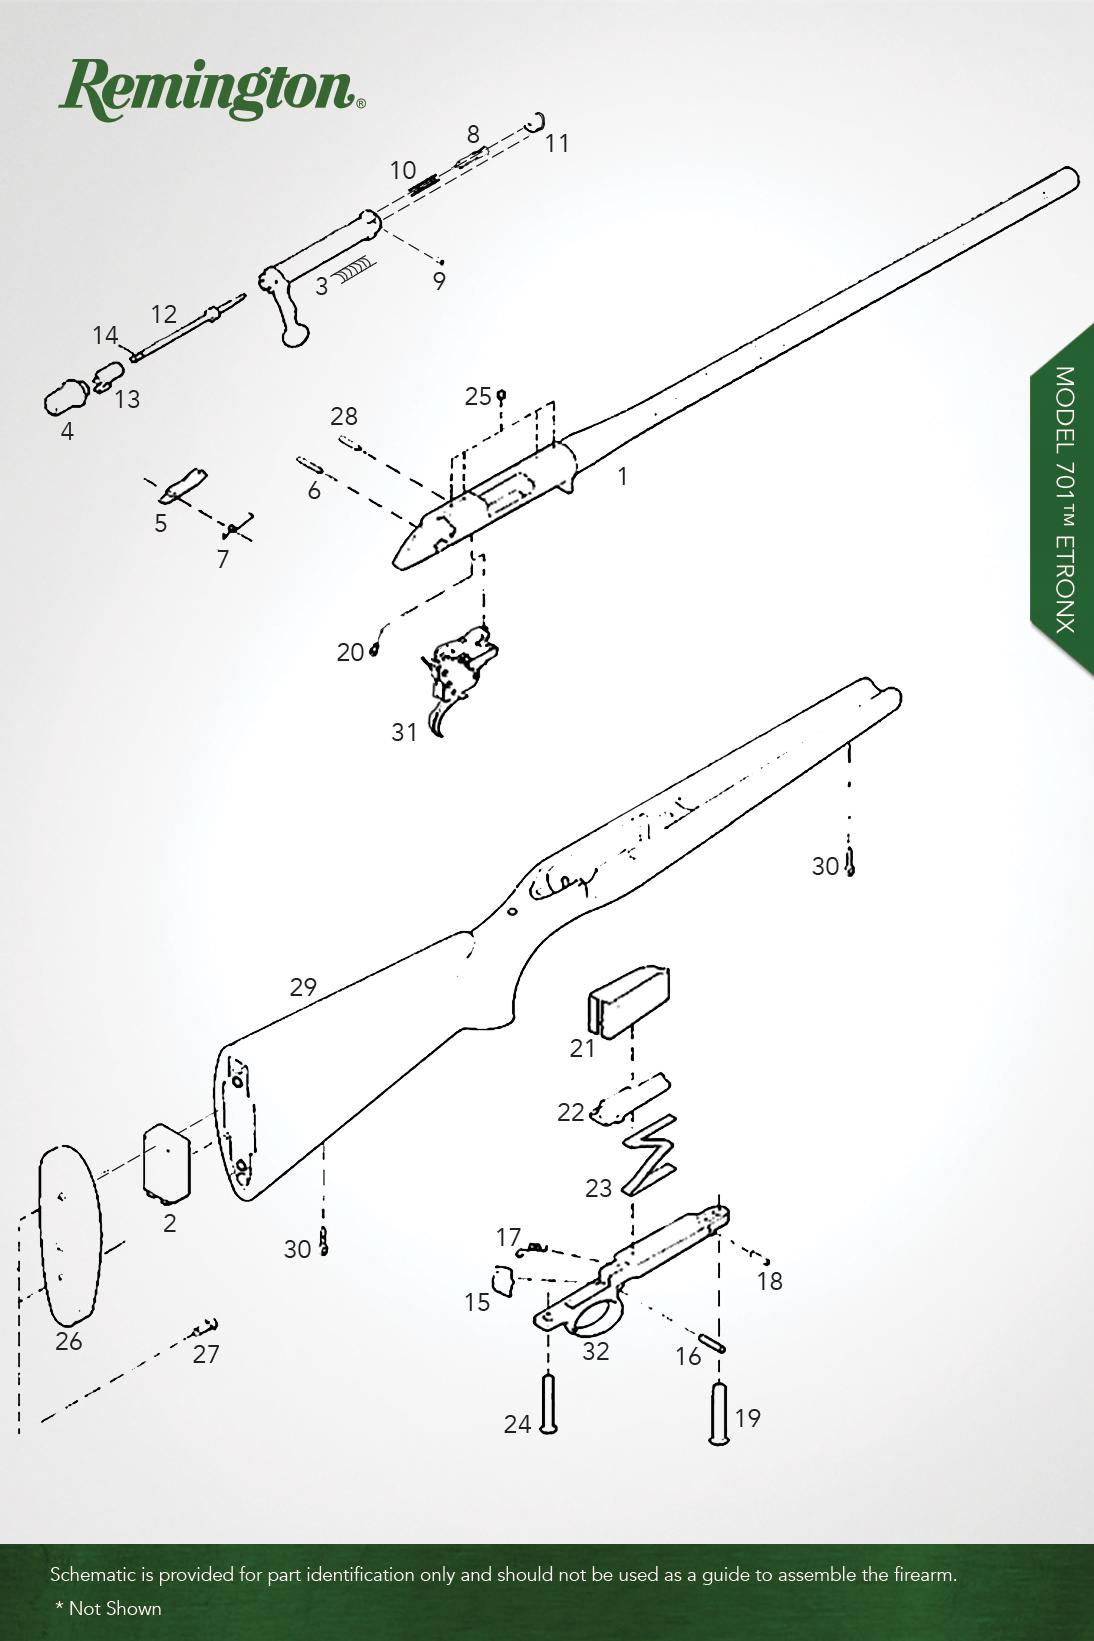 Remington 7400 parts diagram wiring model 700 etronx centerfire rifles remington oem parts mossberg 500 exploded diagram remington 7400 parts diagram publicscrutiny Choice Image